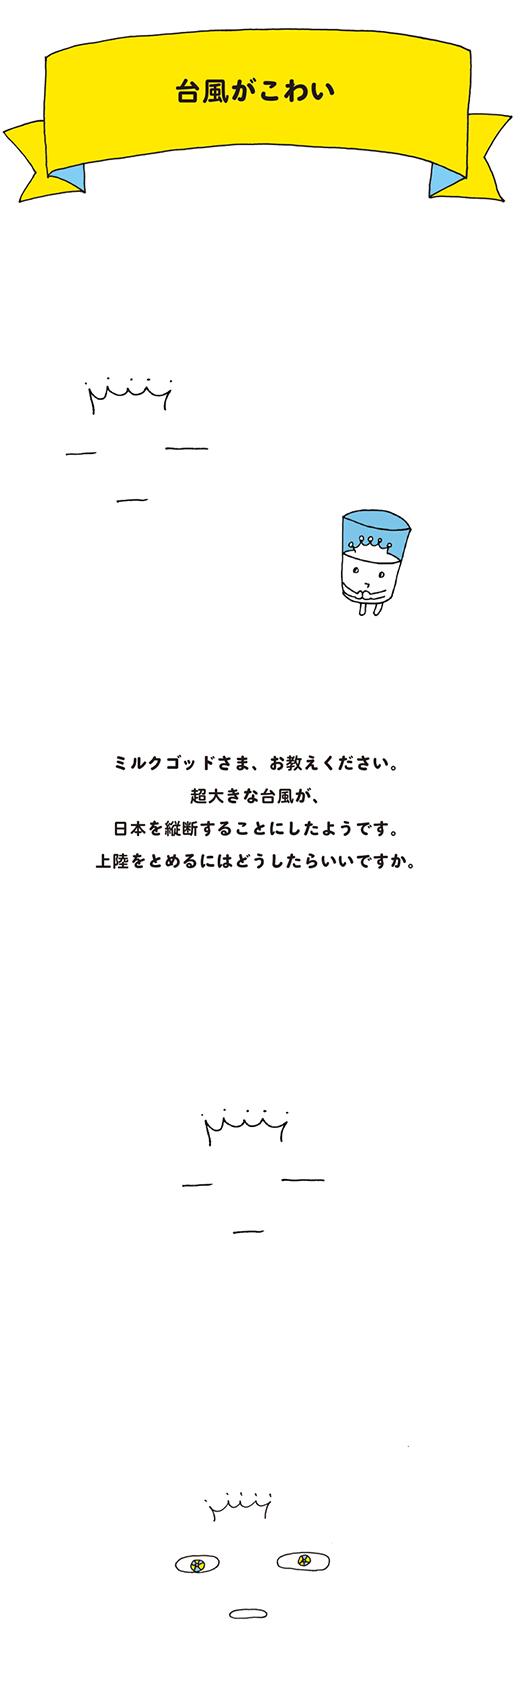 milGOD_1015_01